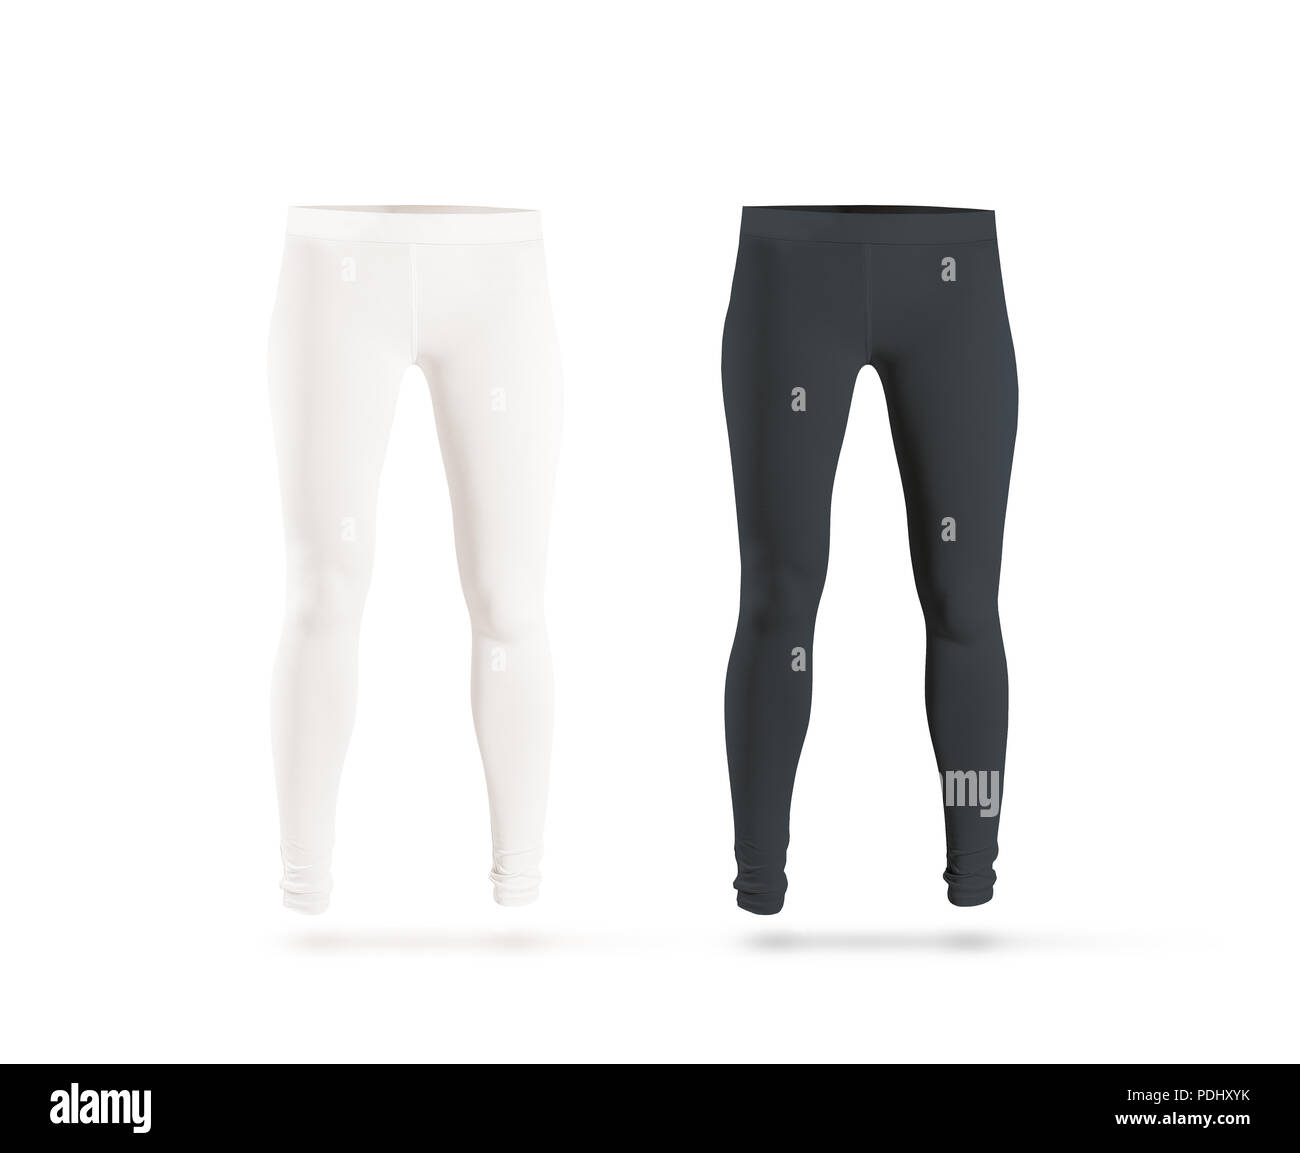 Blank leggings mockup set, black, white, isolated. Clear leggins template. Cloth pants design presentation. Sport pantaloons stretch tights model wearing. Slim legs in apparel. - Stock Image